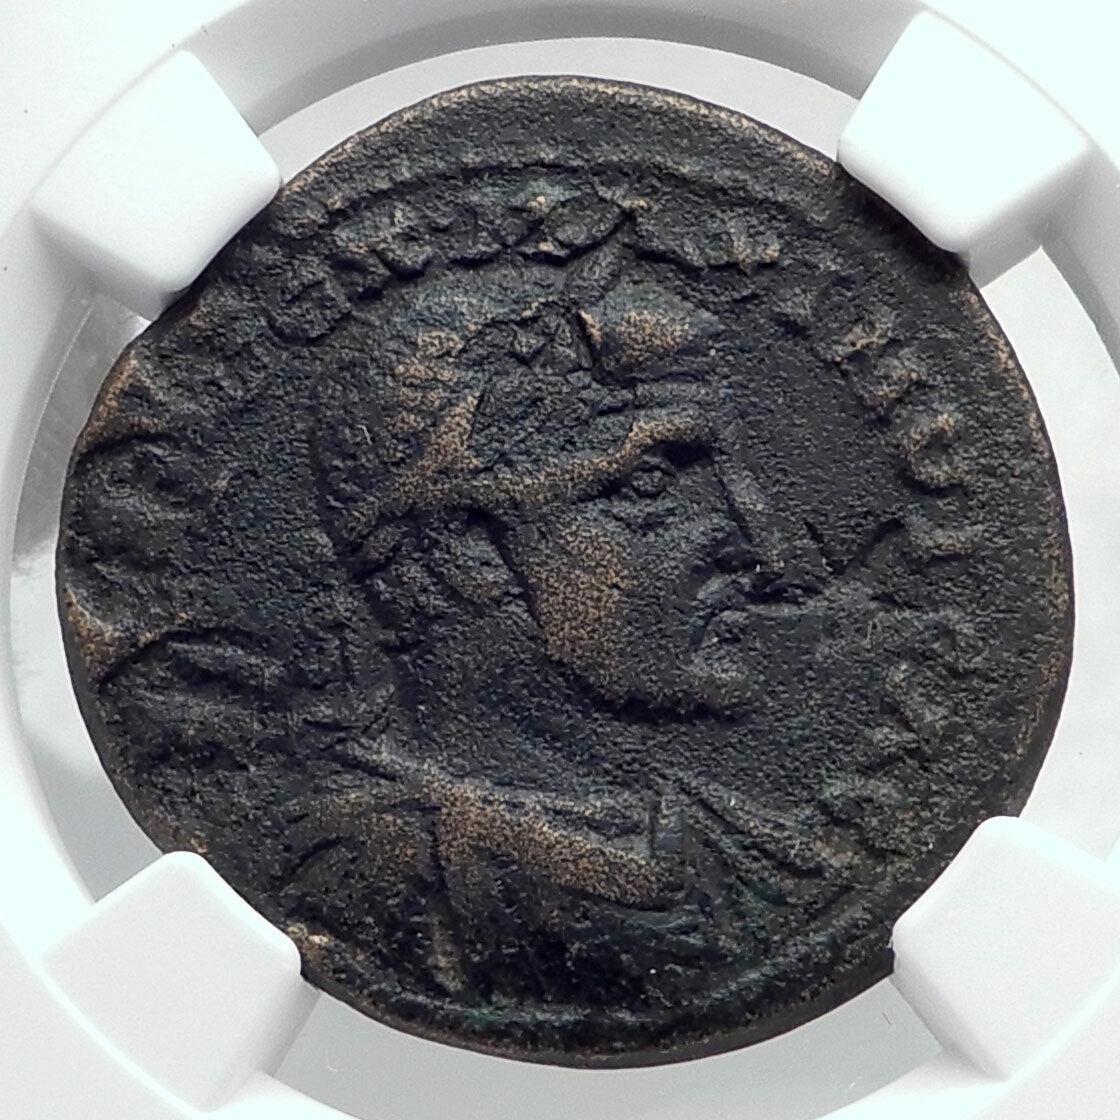 MAXIMINUS I Thrax Ninica-Claudiopolis Cilicia Roman Coin SHE WOLF NGC i80785 2